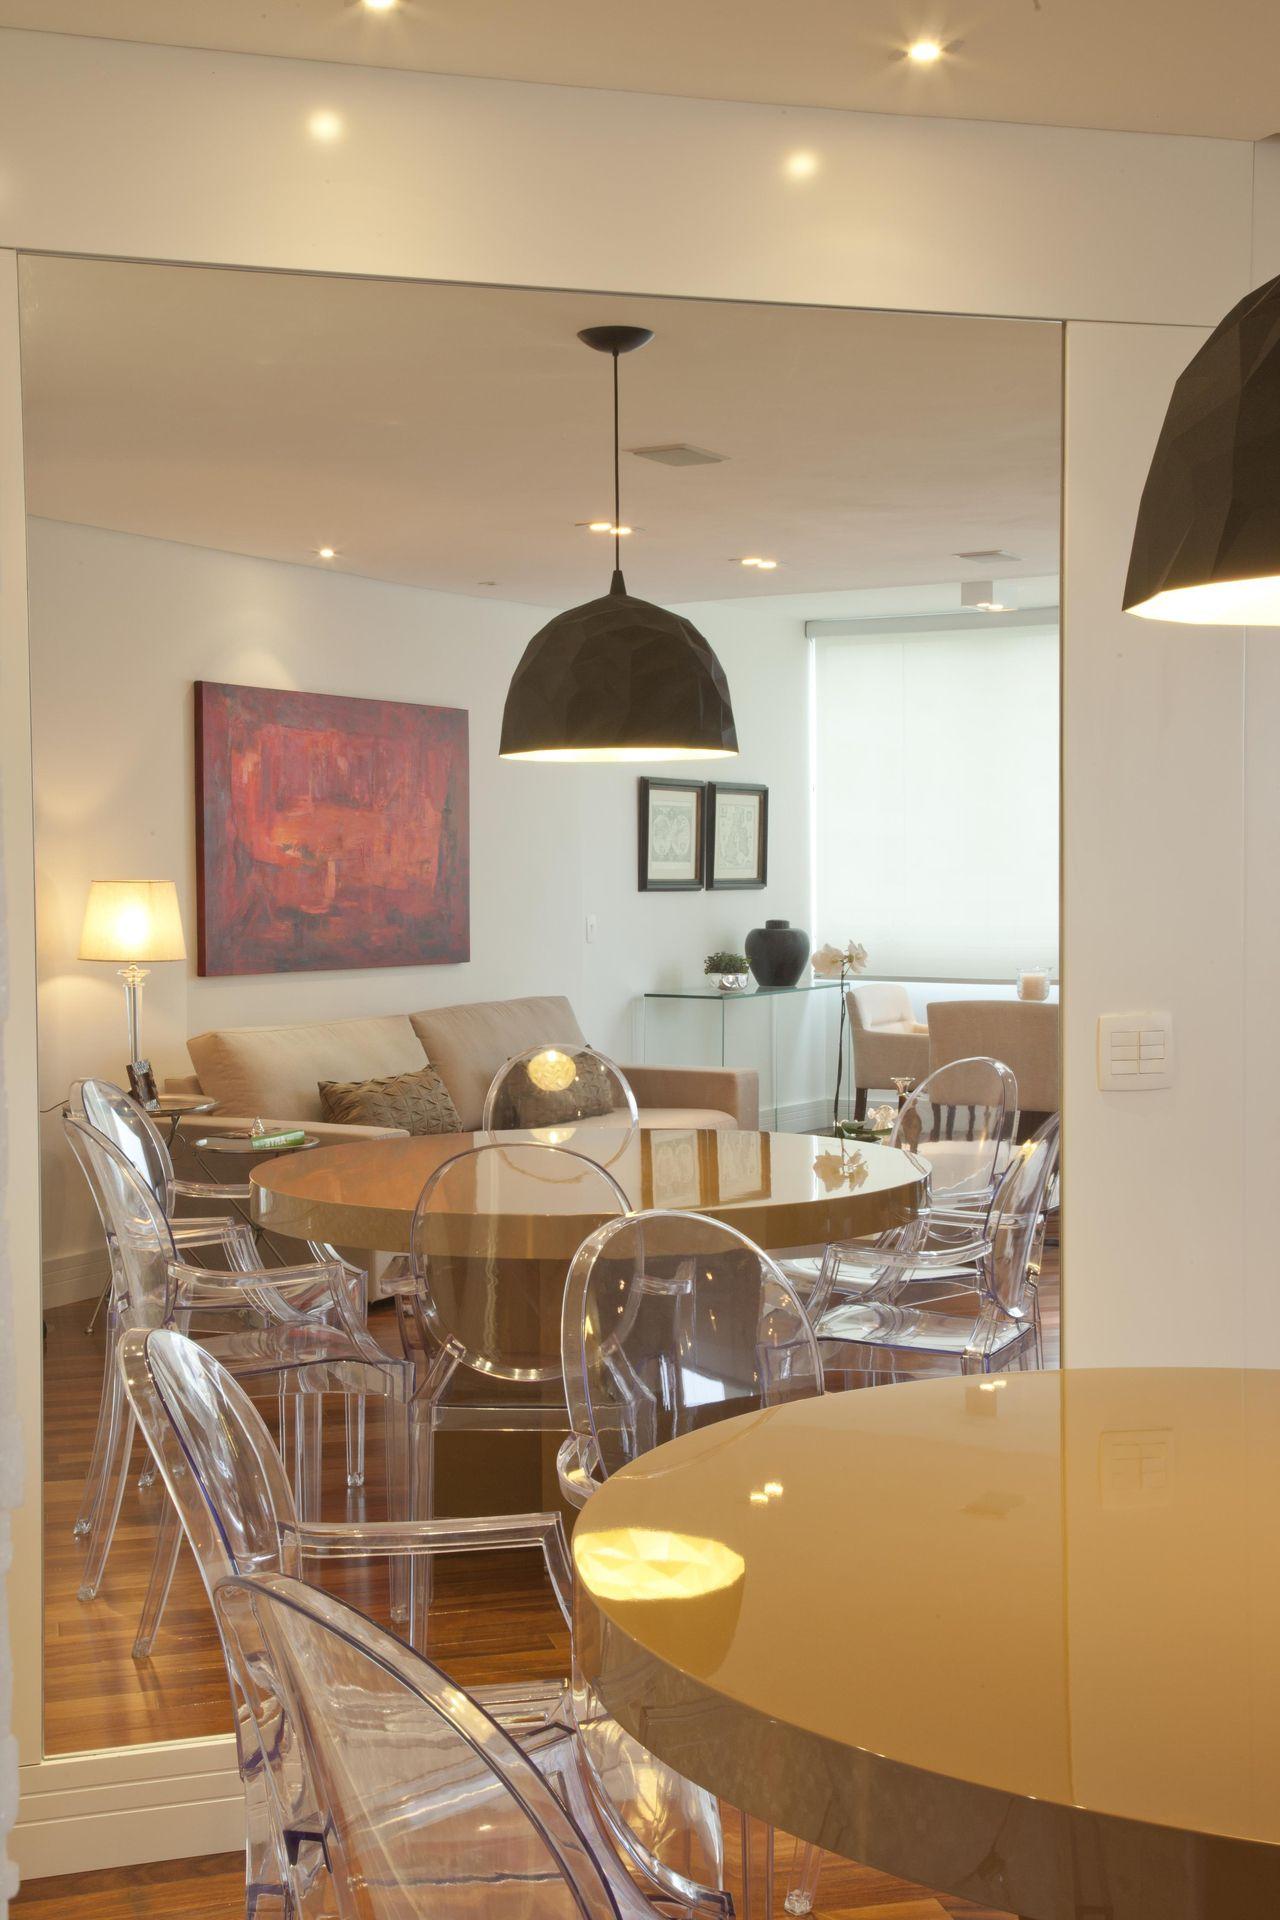 Cadeira De Acr Lico Transparente De Patricia Kolanian Pasquini 583  -> Cadeiras Para Sala De Jantar Acrilico